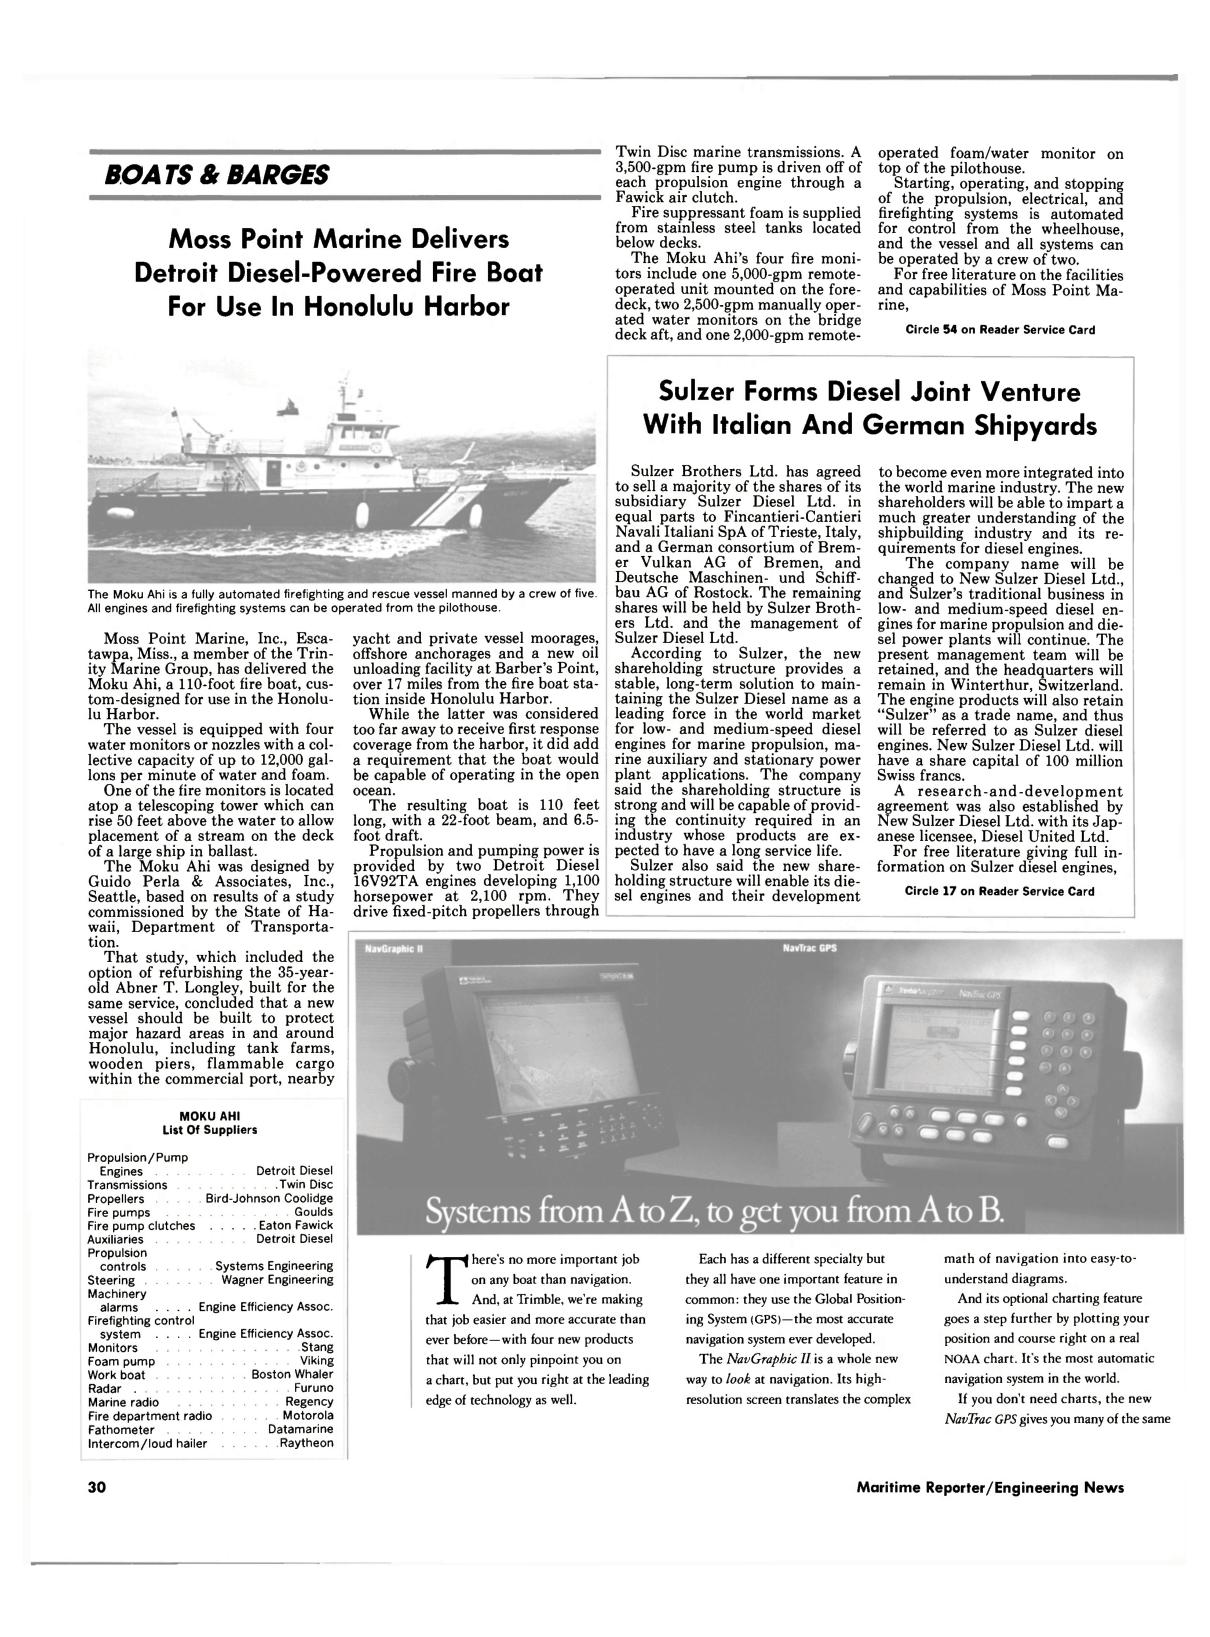 Viewmaritime Reporter And Engineering News September 1990 Viking 2000a Intercom Wiring Diagram 28